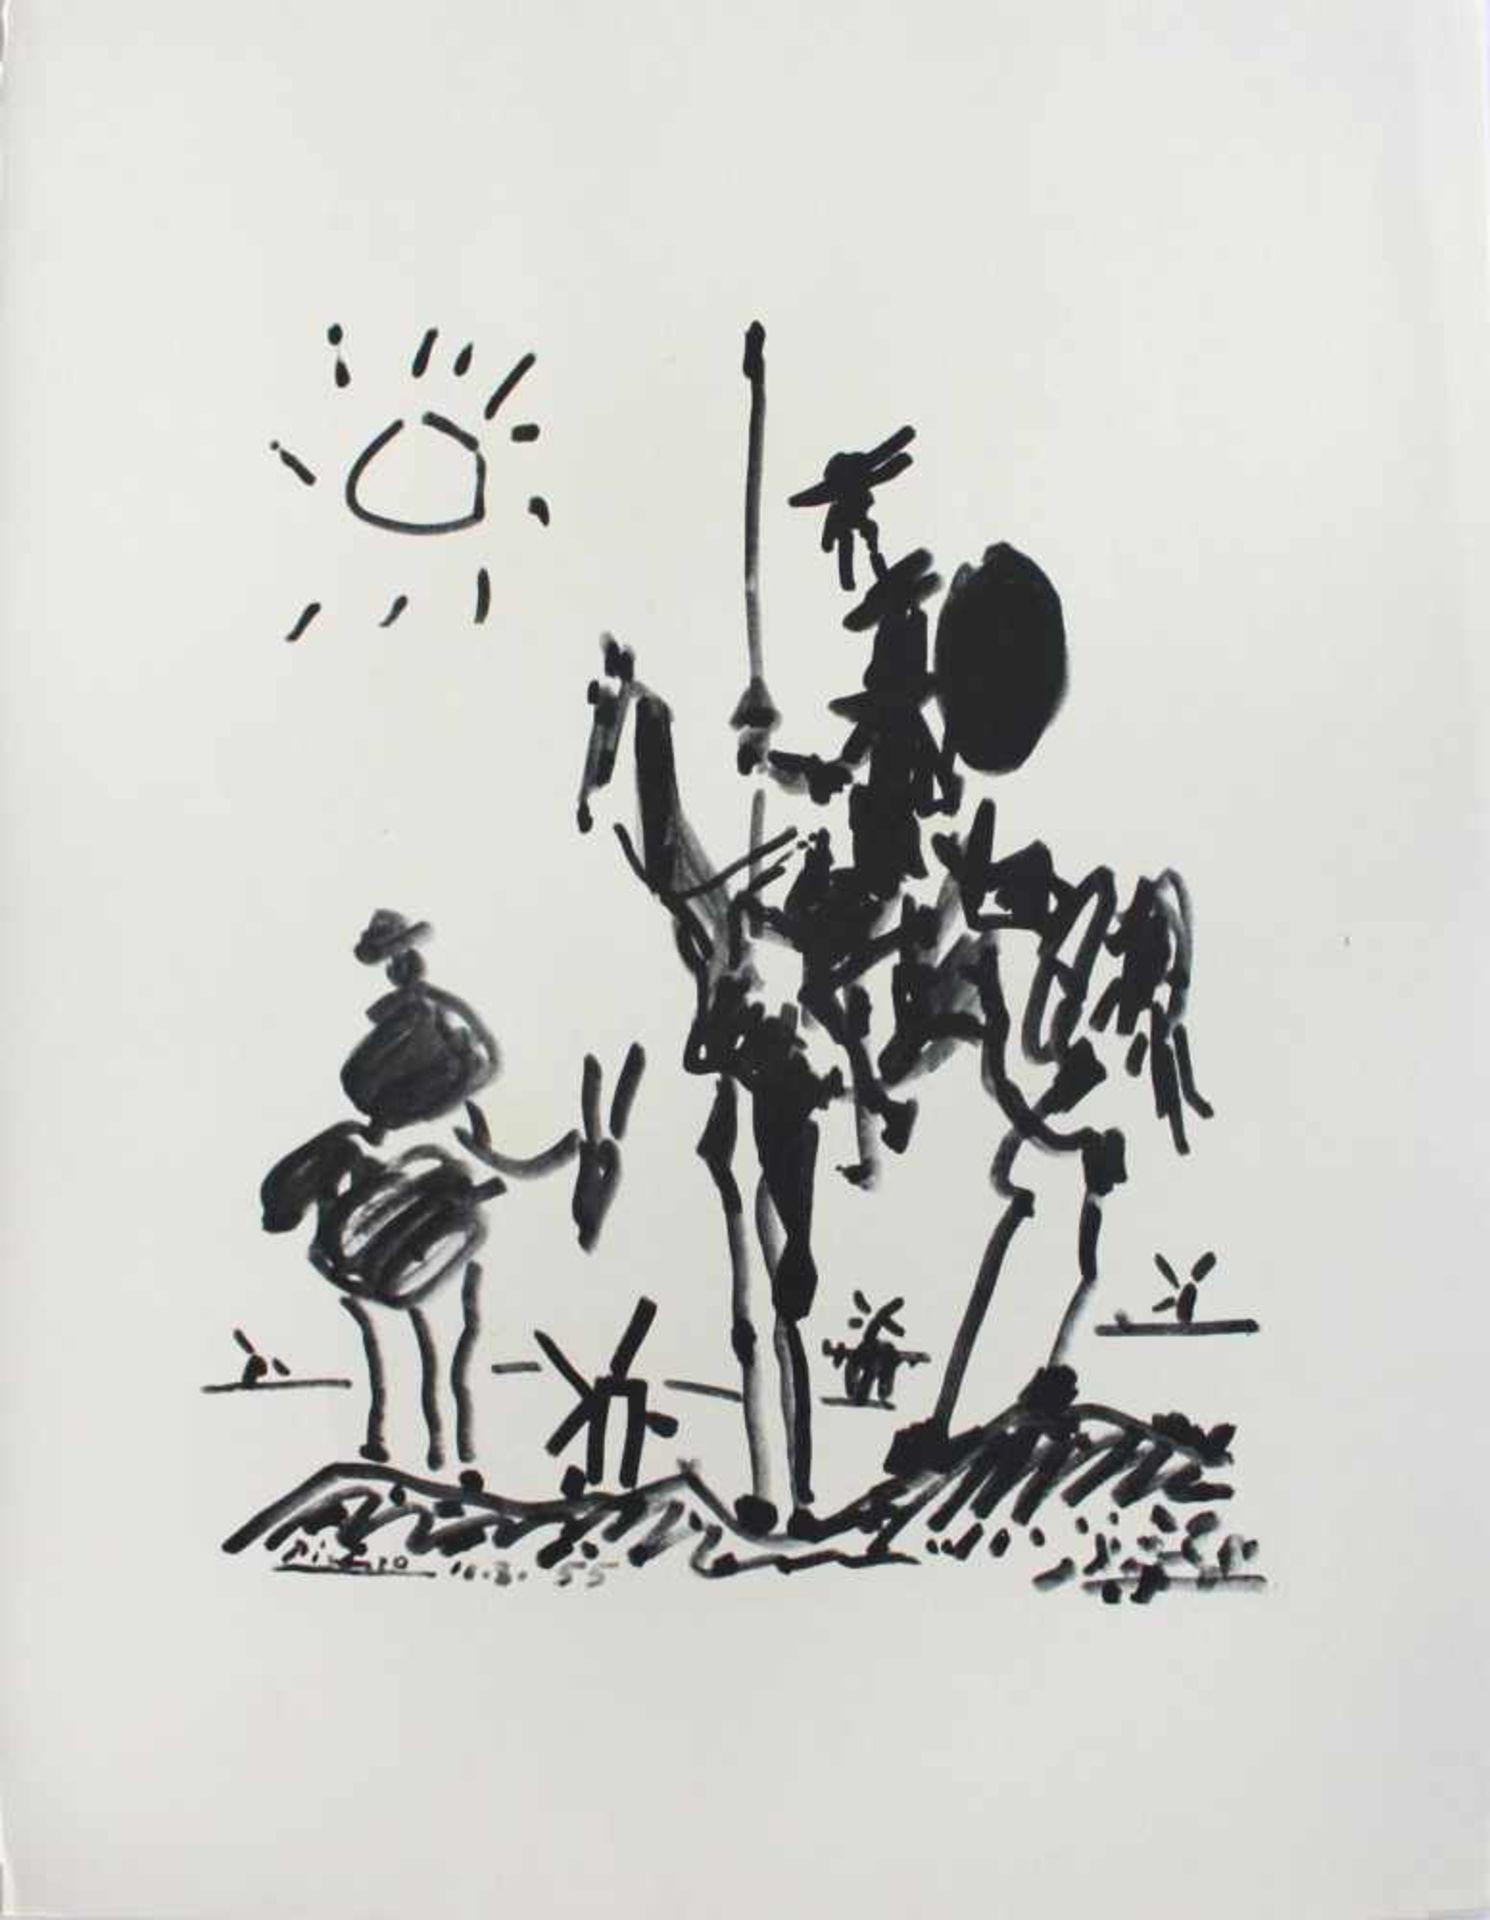 Pablo Picasso 1881 - 1973 Don Quichote und Sanjo Panza Pochoir Lithographie signatur und Datum